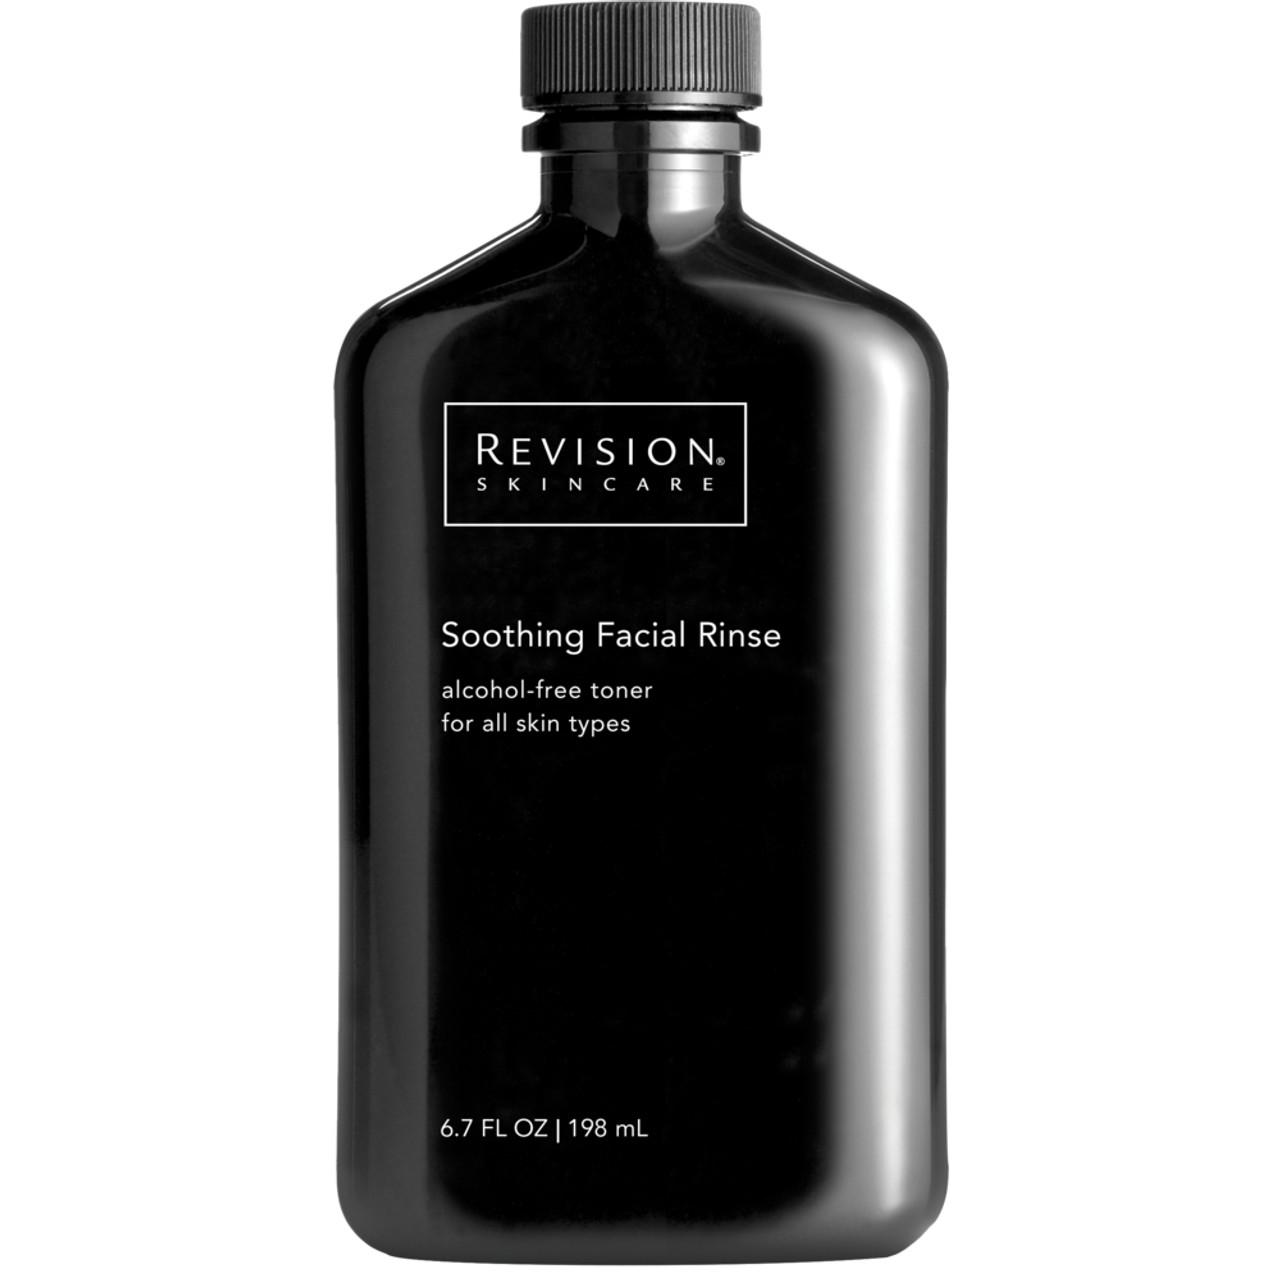 Revision Soothing Facial Rinse BeautifiedYou.com